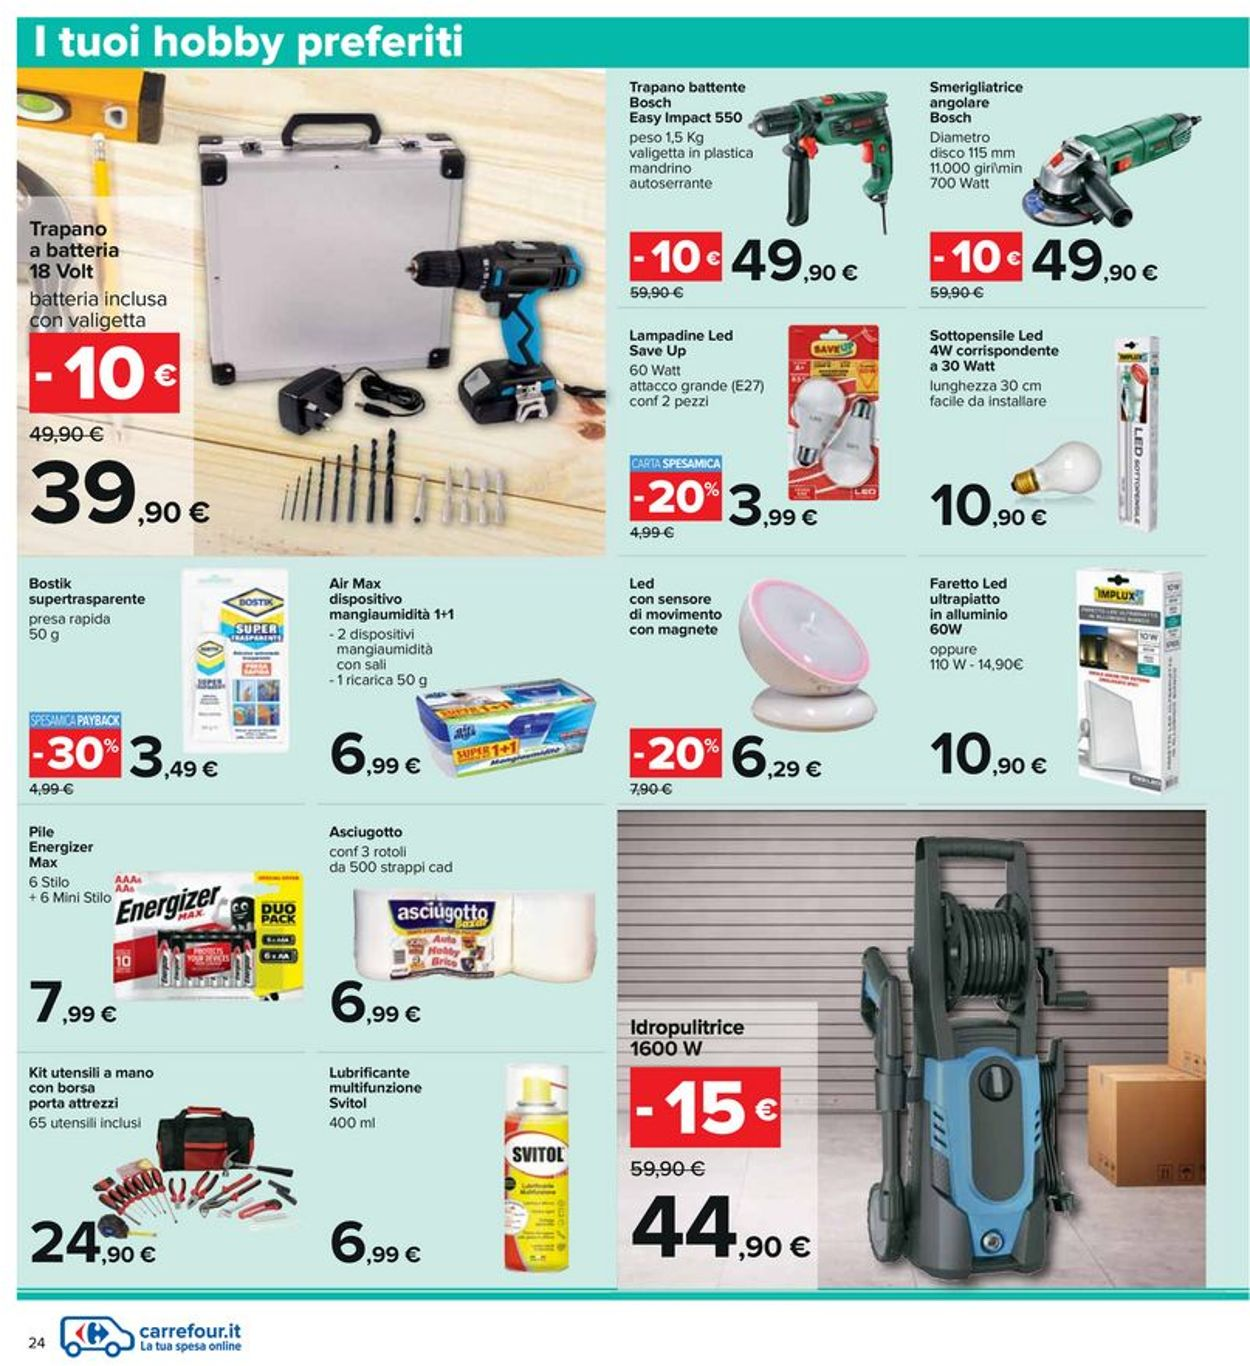 Volantino Carrefour - Offerte 29/07-11/08/2021 (Pagina 24)